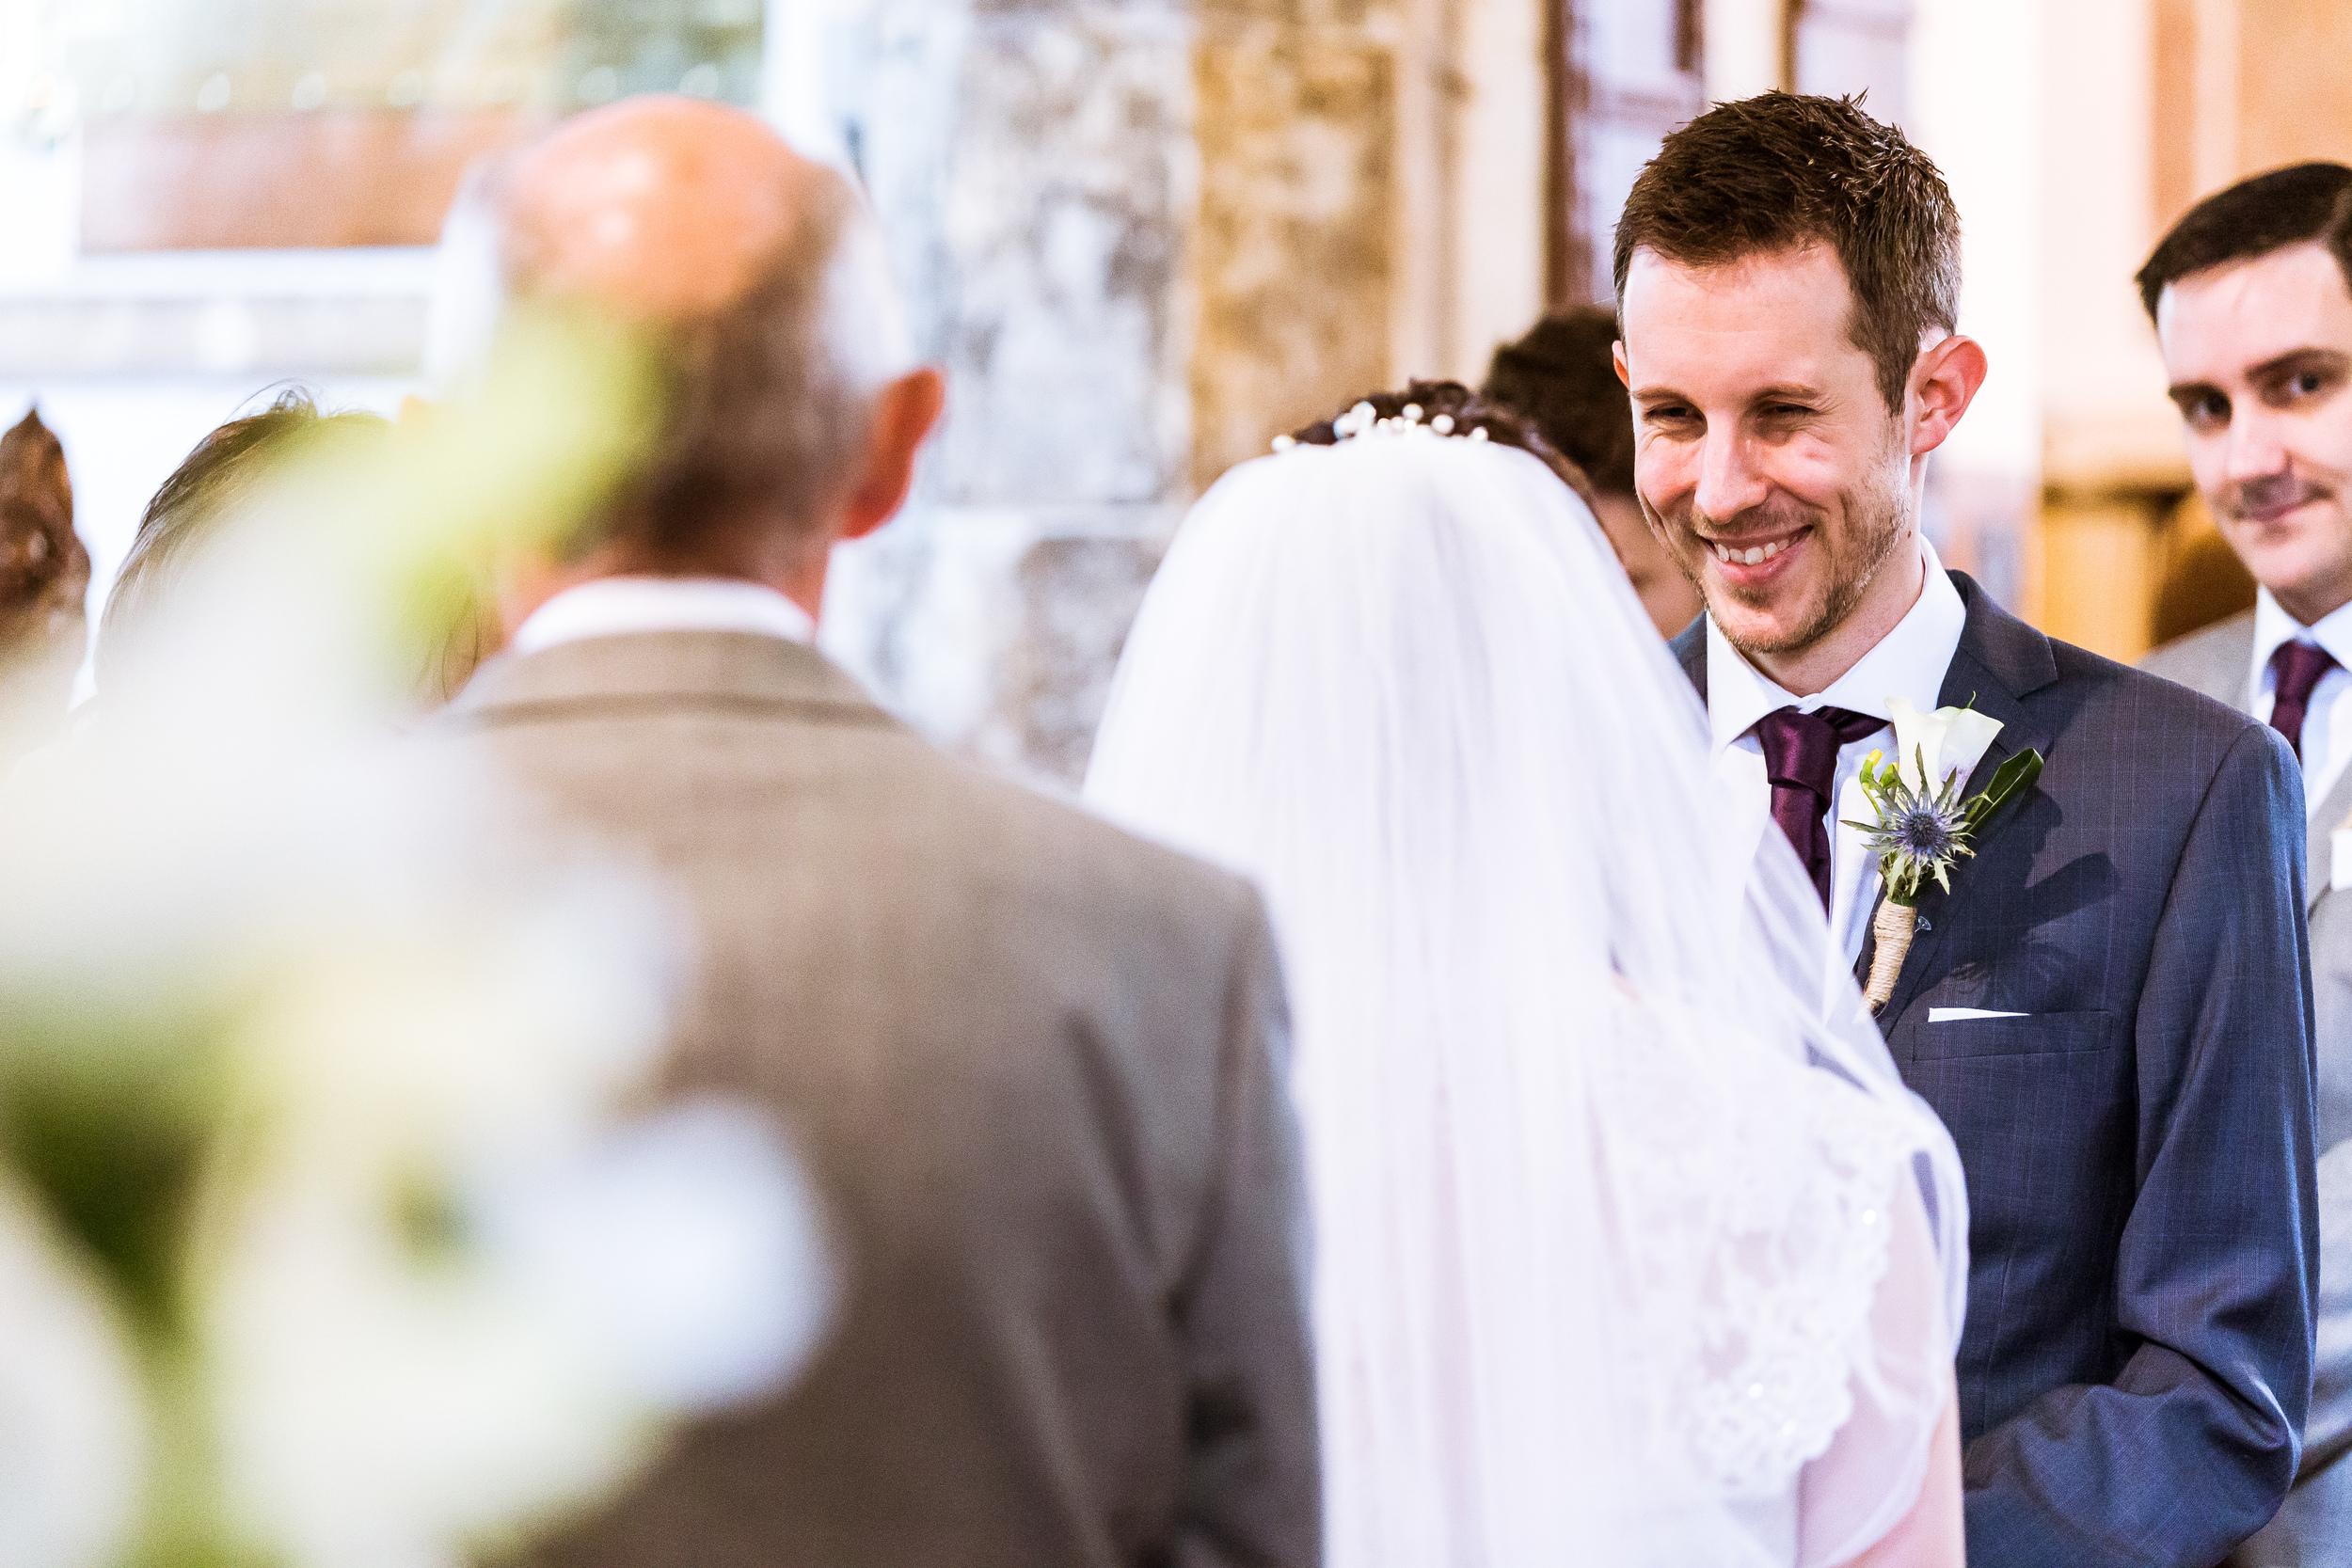 Church wedding in kent, groom looking at wife